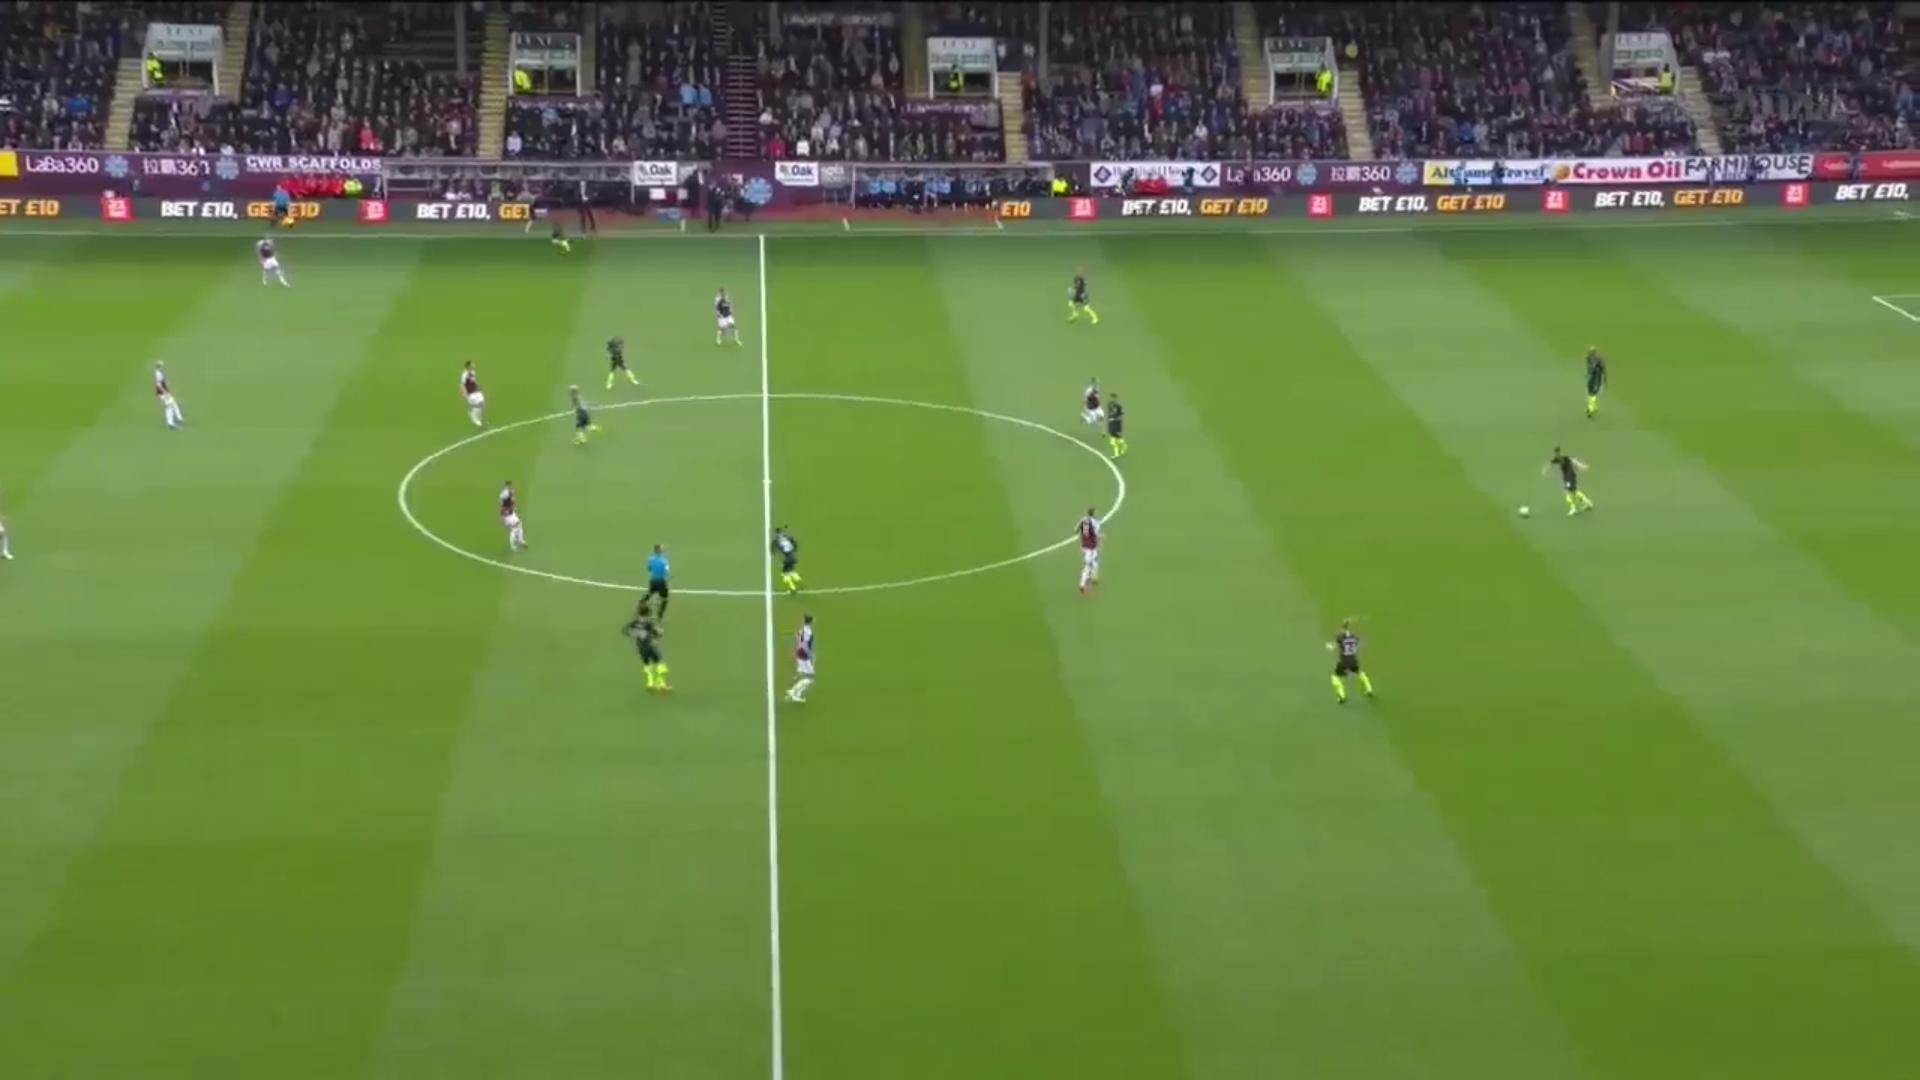 28-04-2019 - Burnley 0-1 Manchester City